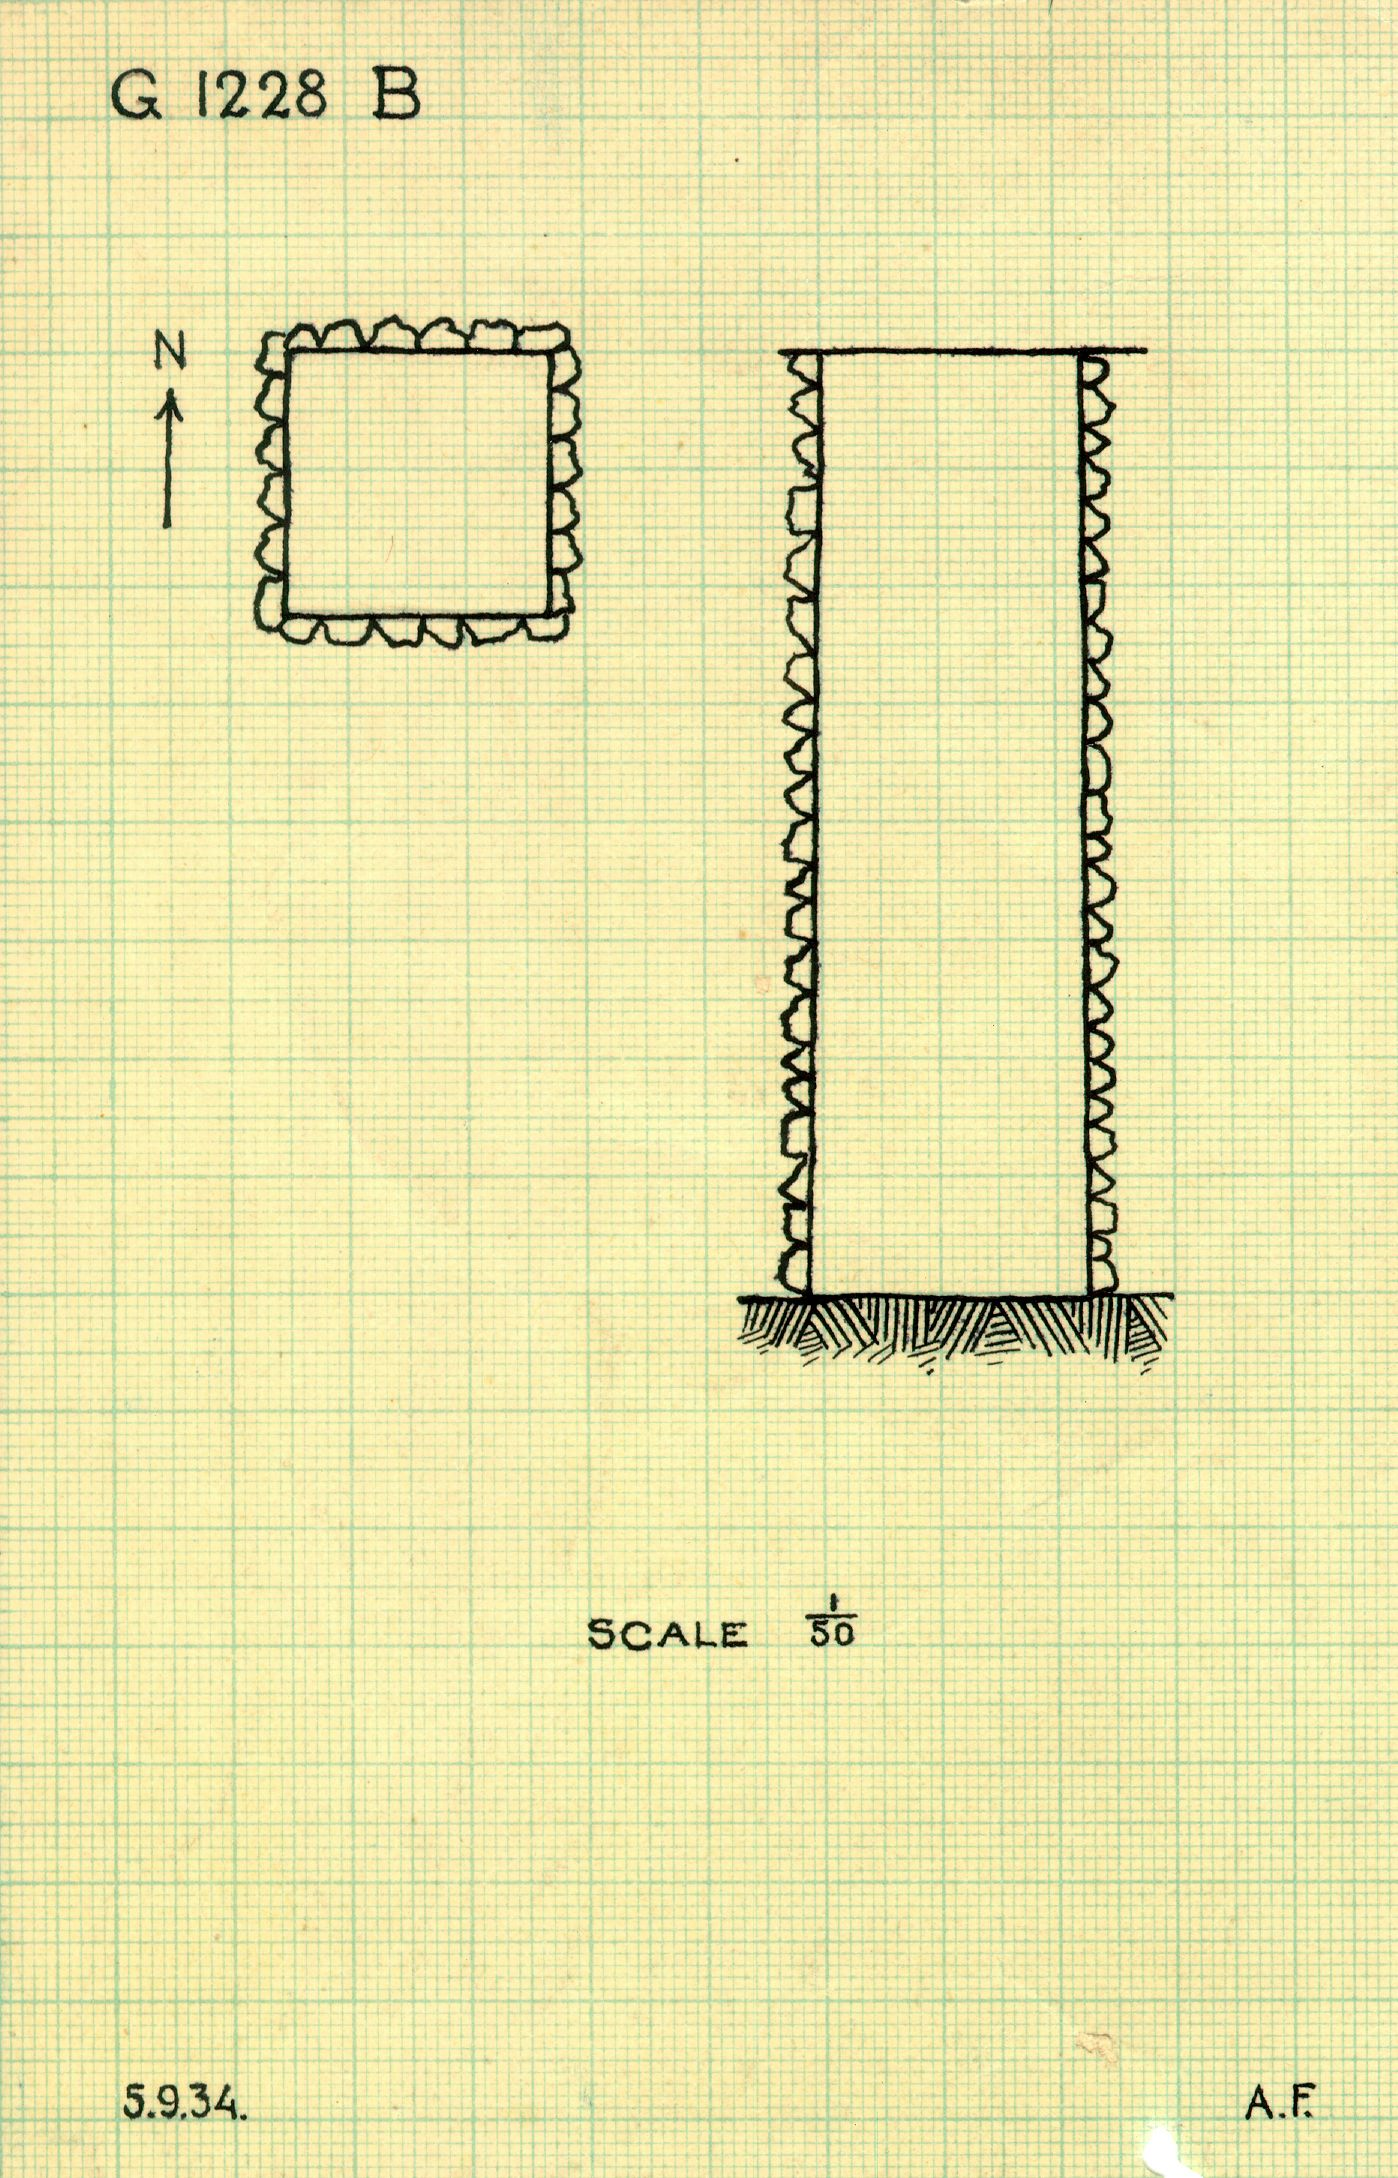 Maps and plans: G 1228 (= G 1227-Annex), Shaft B